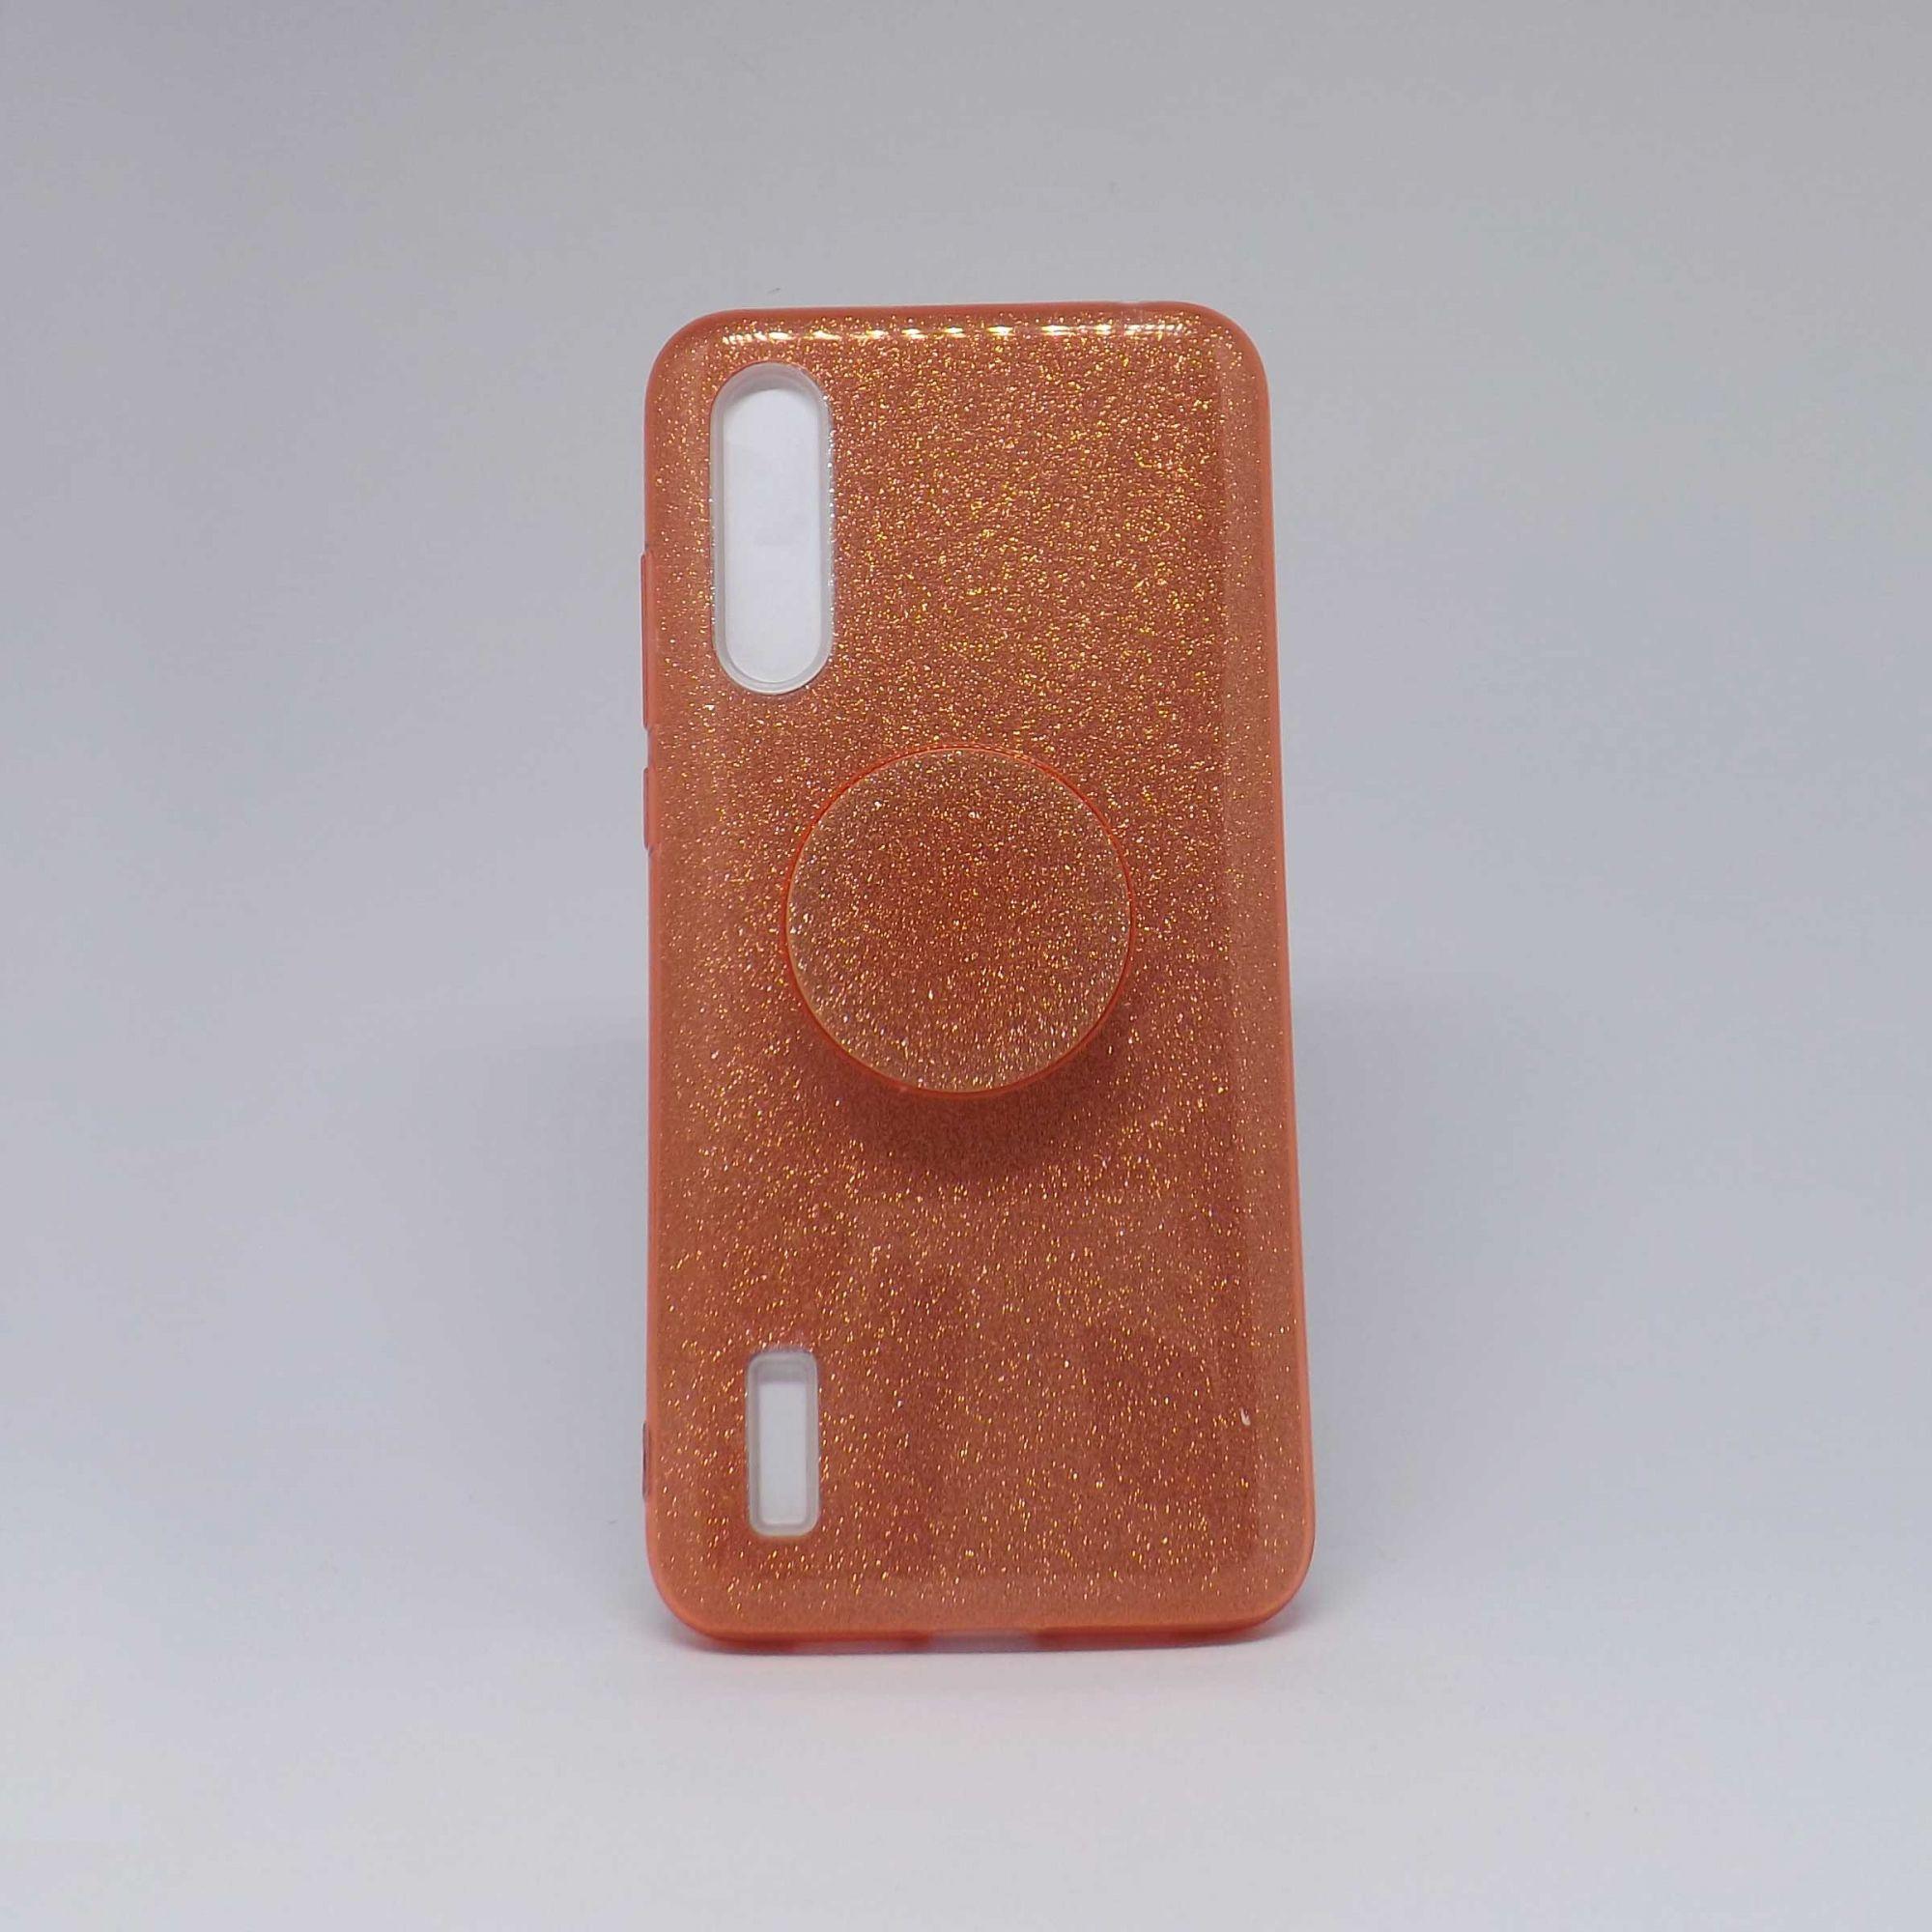 Capa Xiaomi Mi 9 Lite Brilho com Pop Case